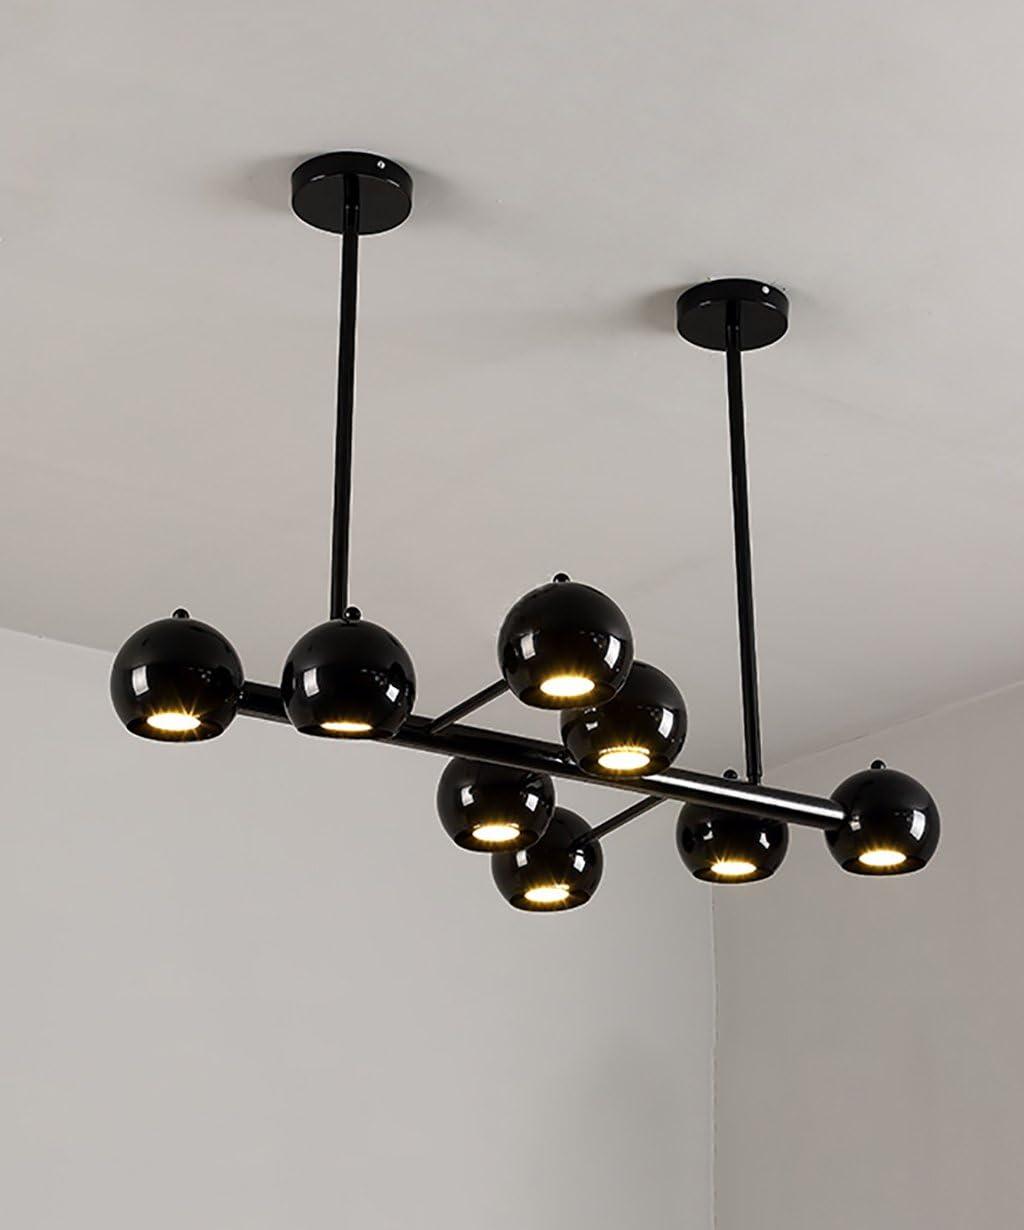 Postmodernas - Lámpara de techo con 8 cabezales LED para salón, bar, comedor, dormitorio, foco, luces decorativas